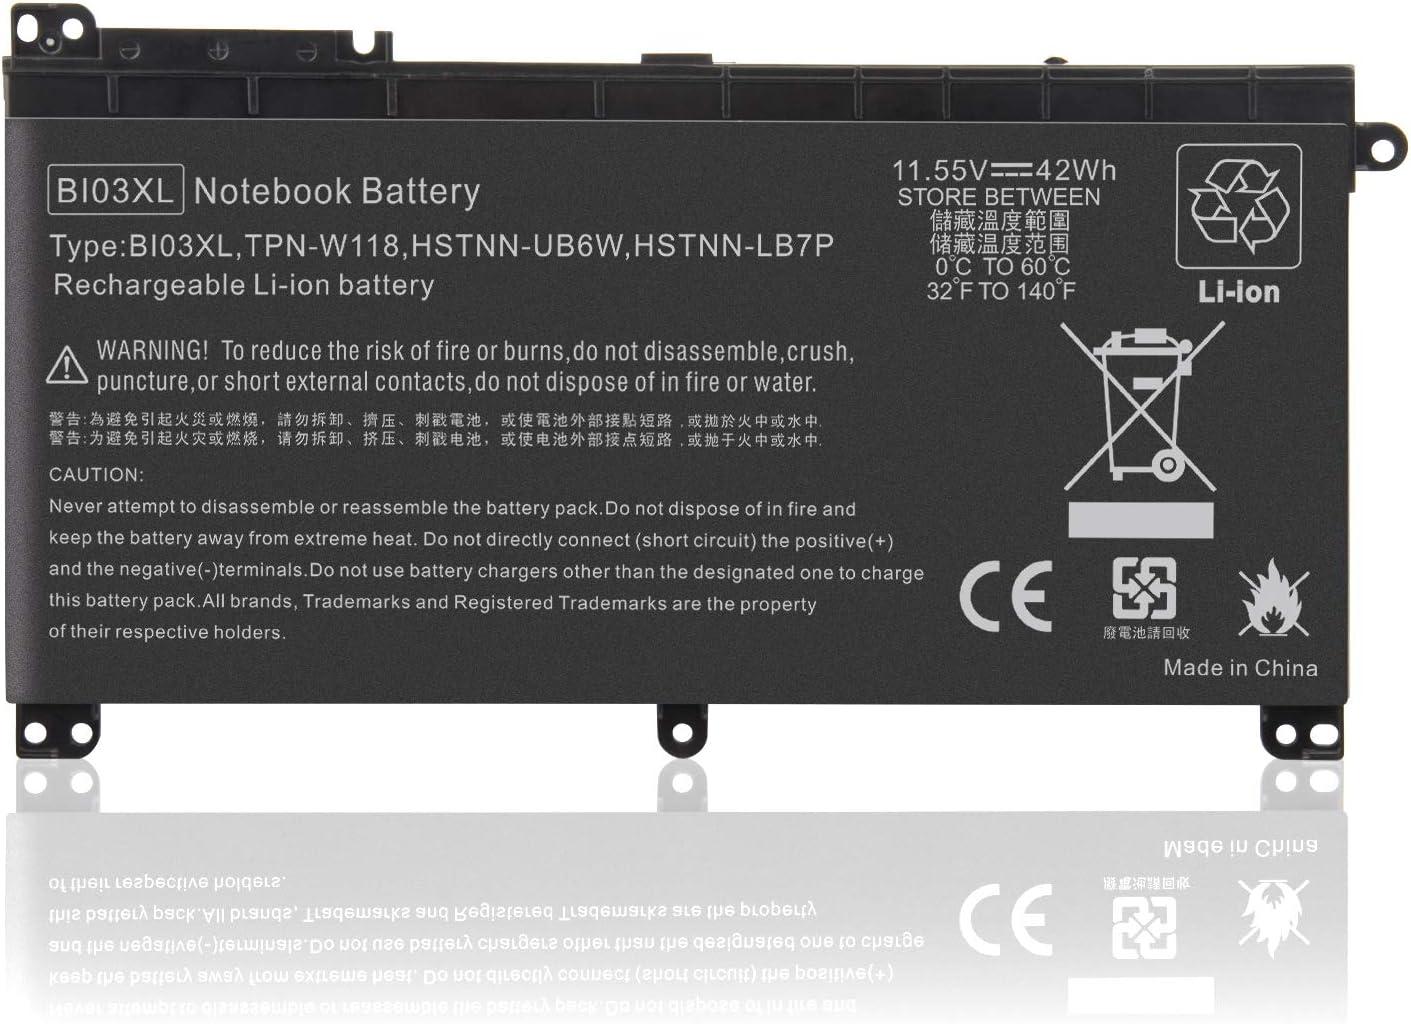 BI03XL Laptop Battery Compatible with HP Pavilion X360 13-U M3-U 13-u000 M3-U001DX M3-U103DX 13-U100TU 13-U118TU Stream 14-AX 14-ax010wm 14-ax010nr ON03XL 0N03XL 844203-855